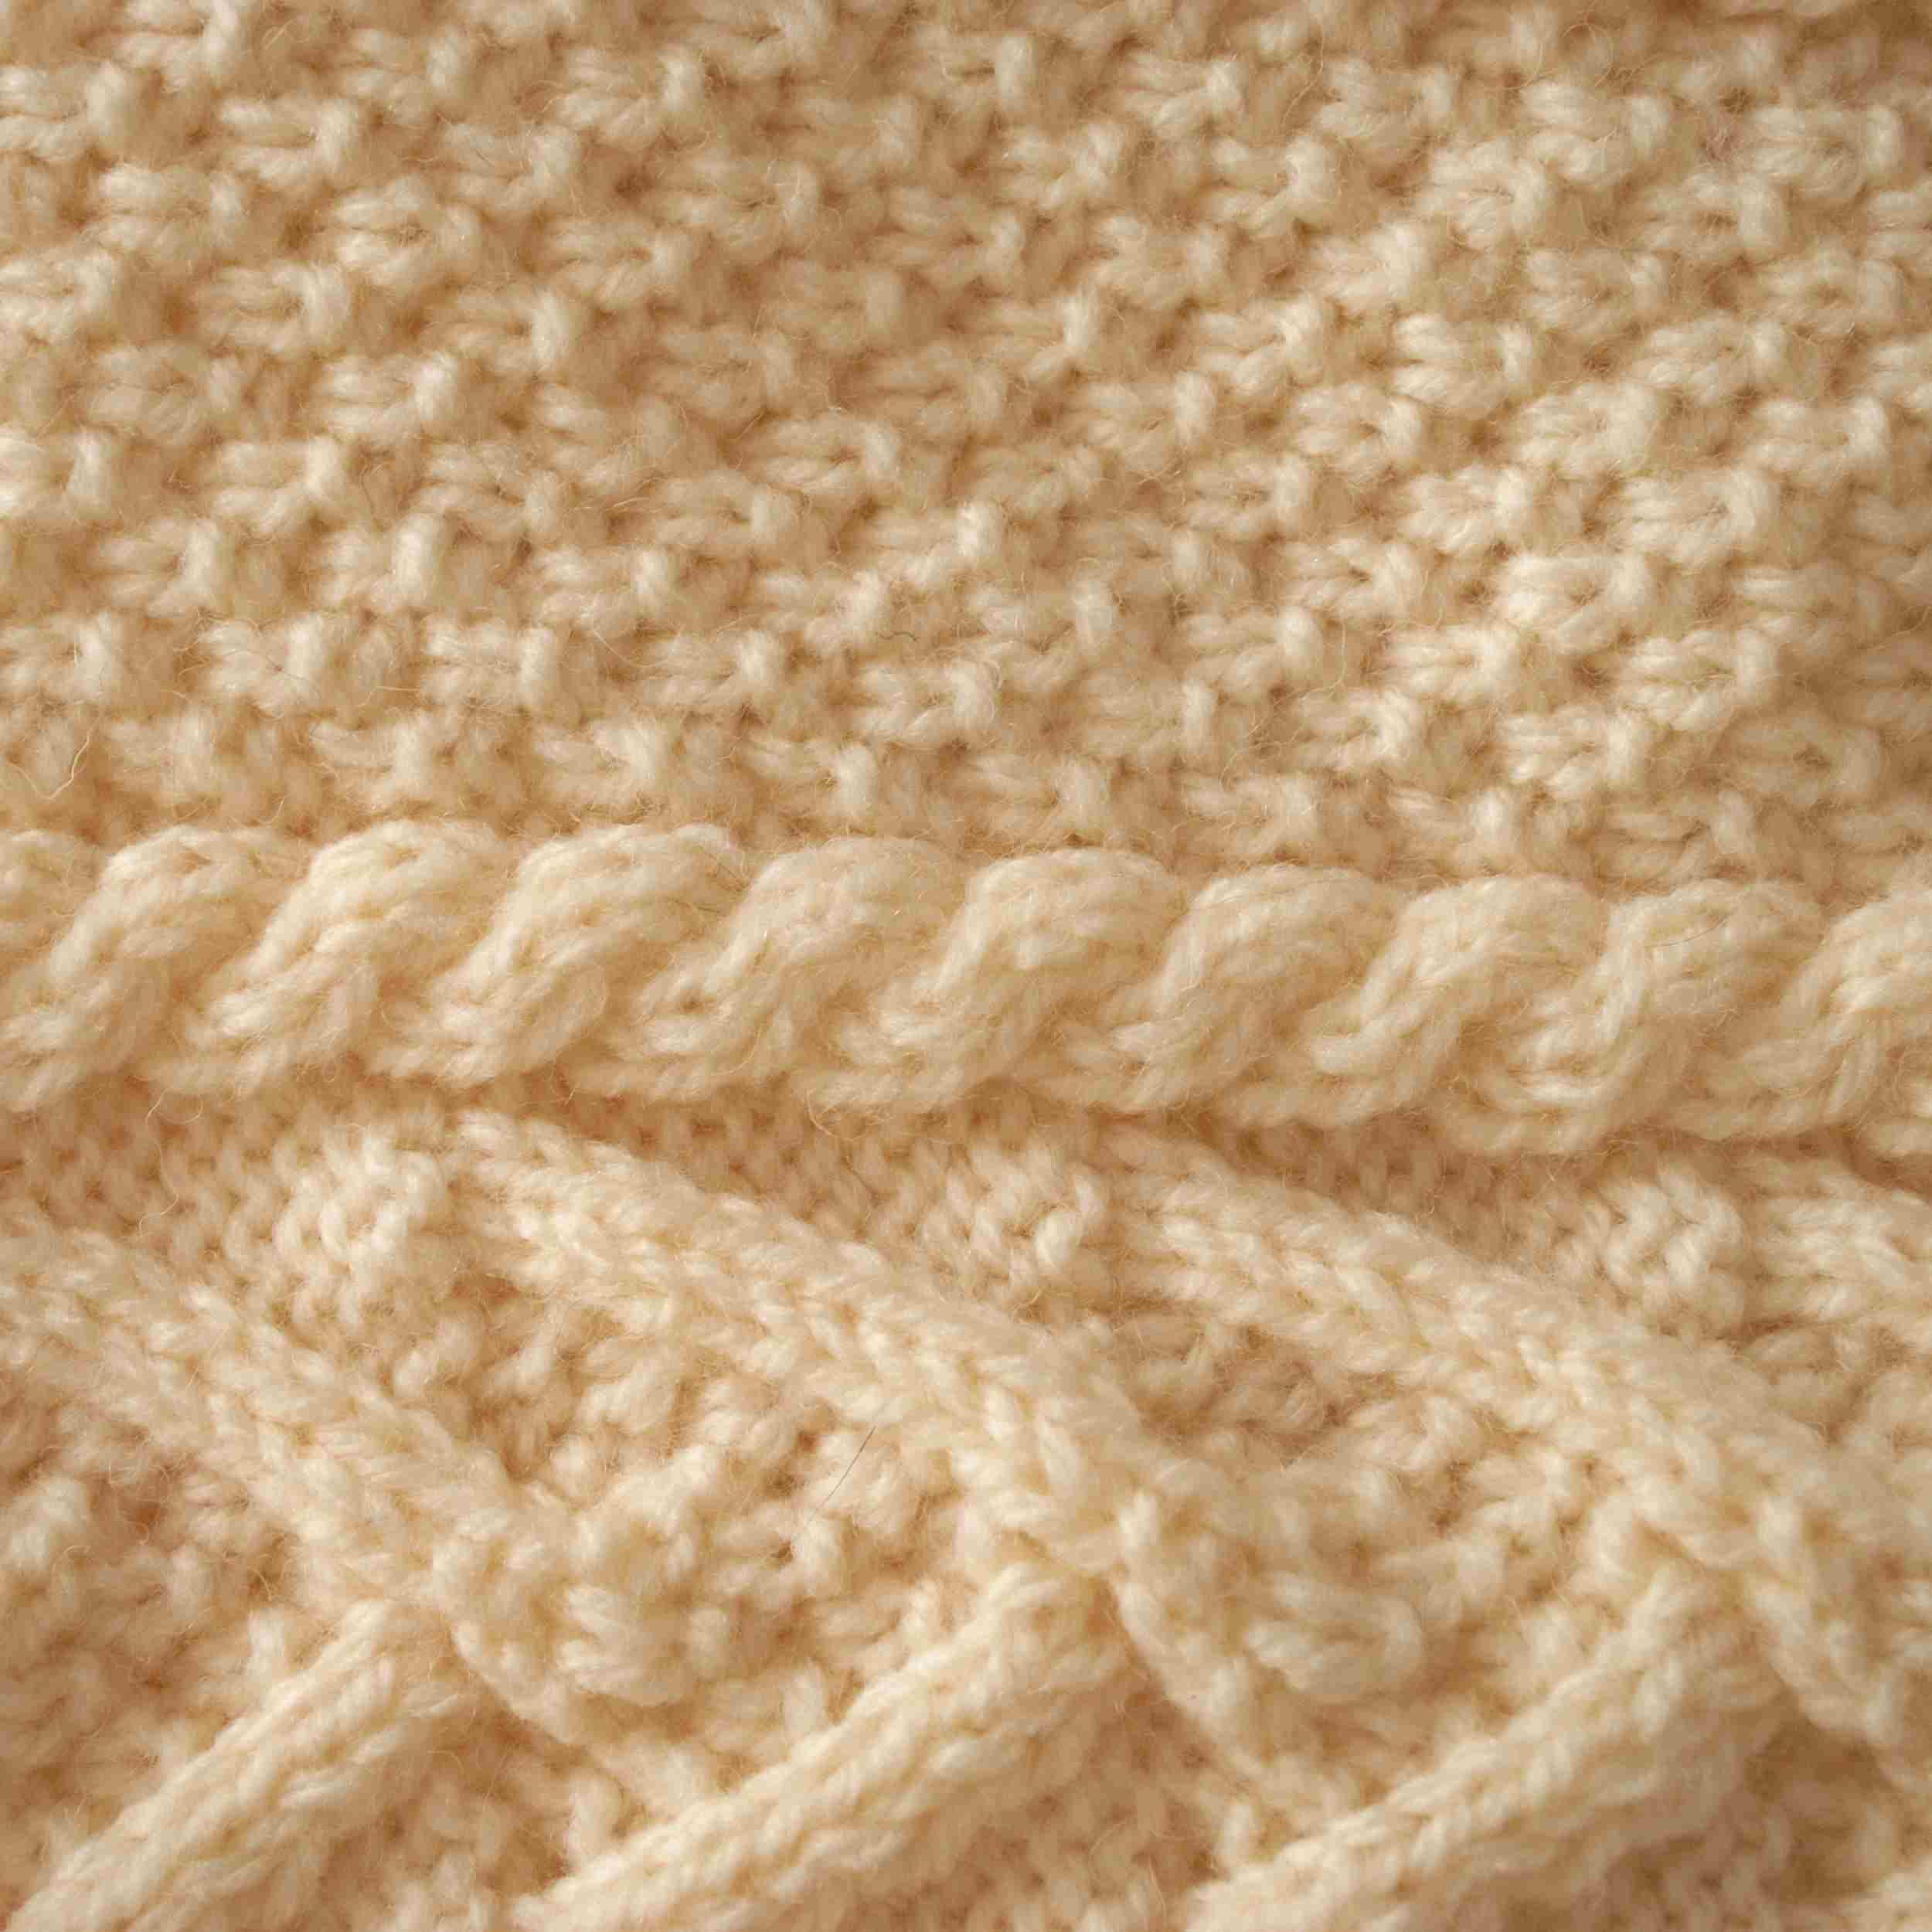 Aran Knit Background